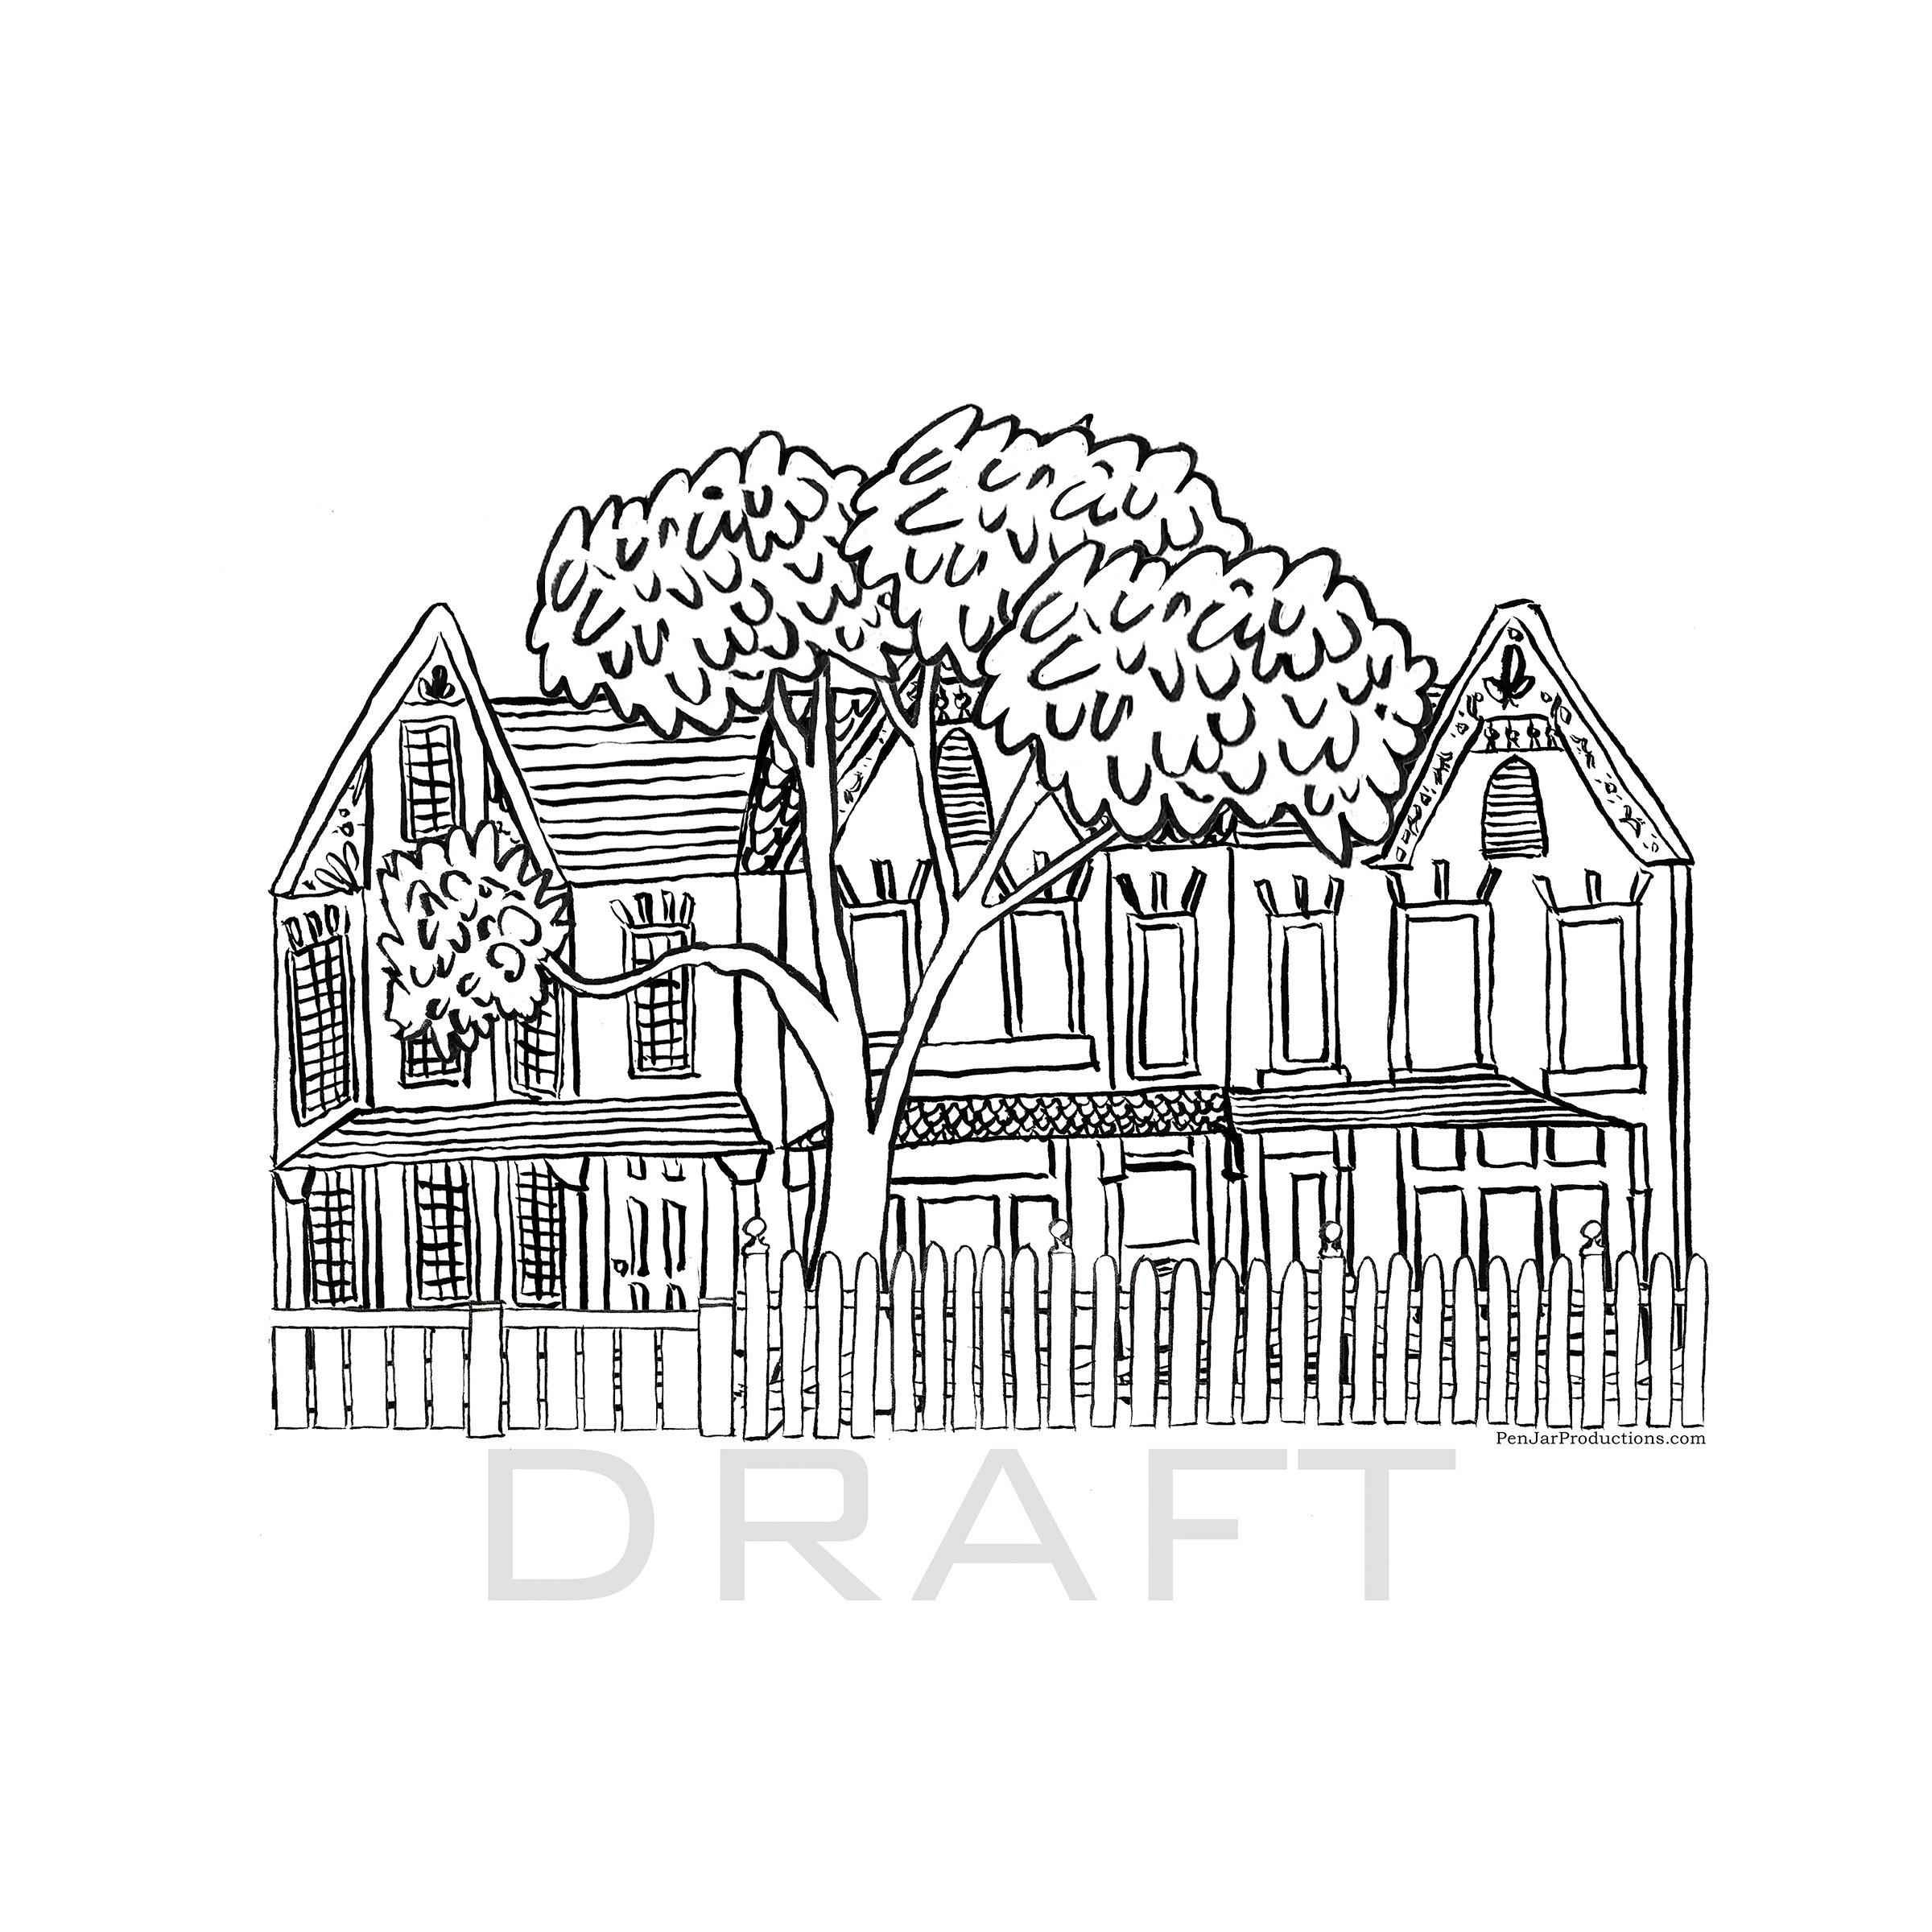 Illustrator Alison Garwood-Jones does a prep sketch for a custom house illustration.